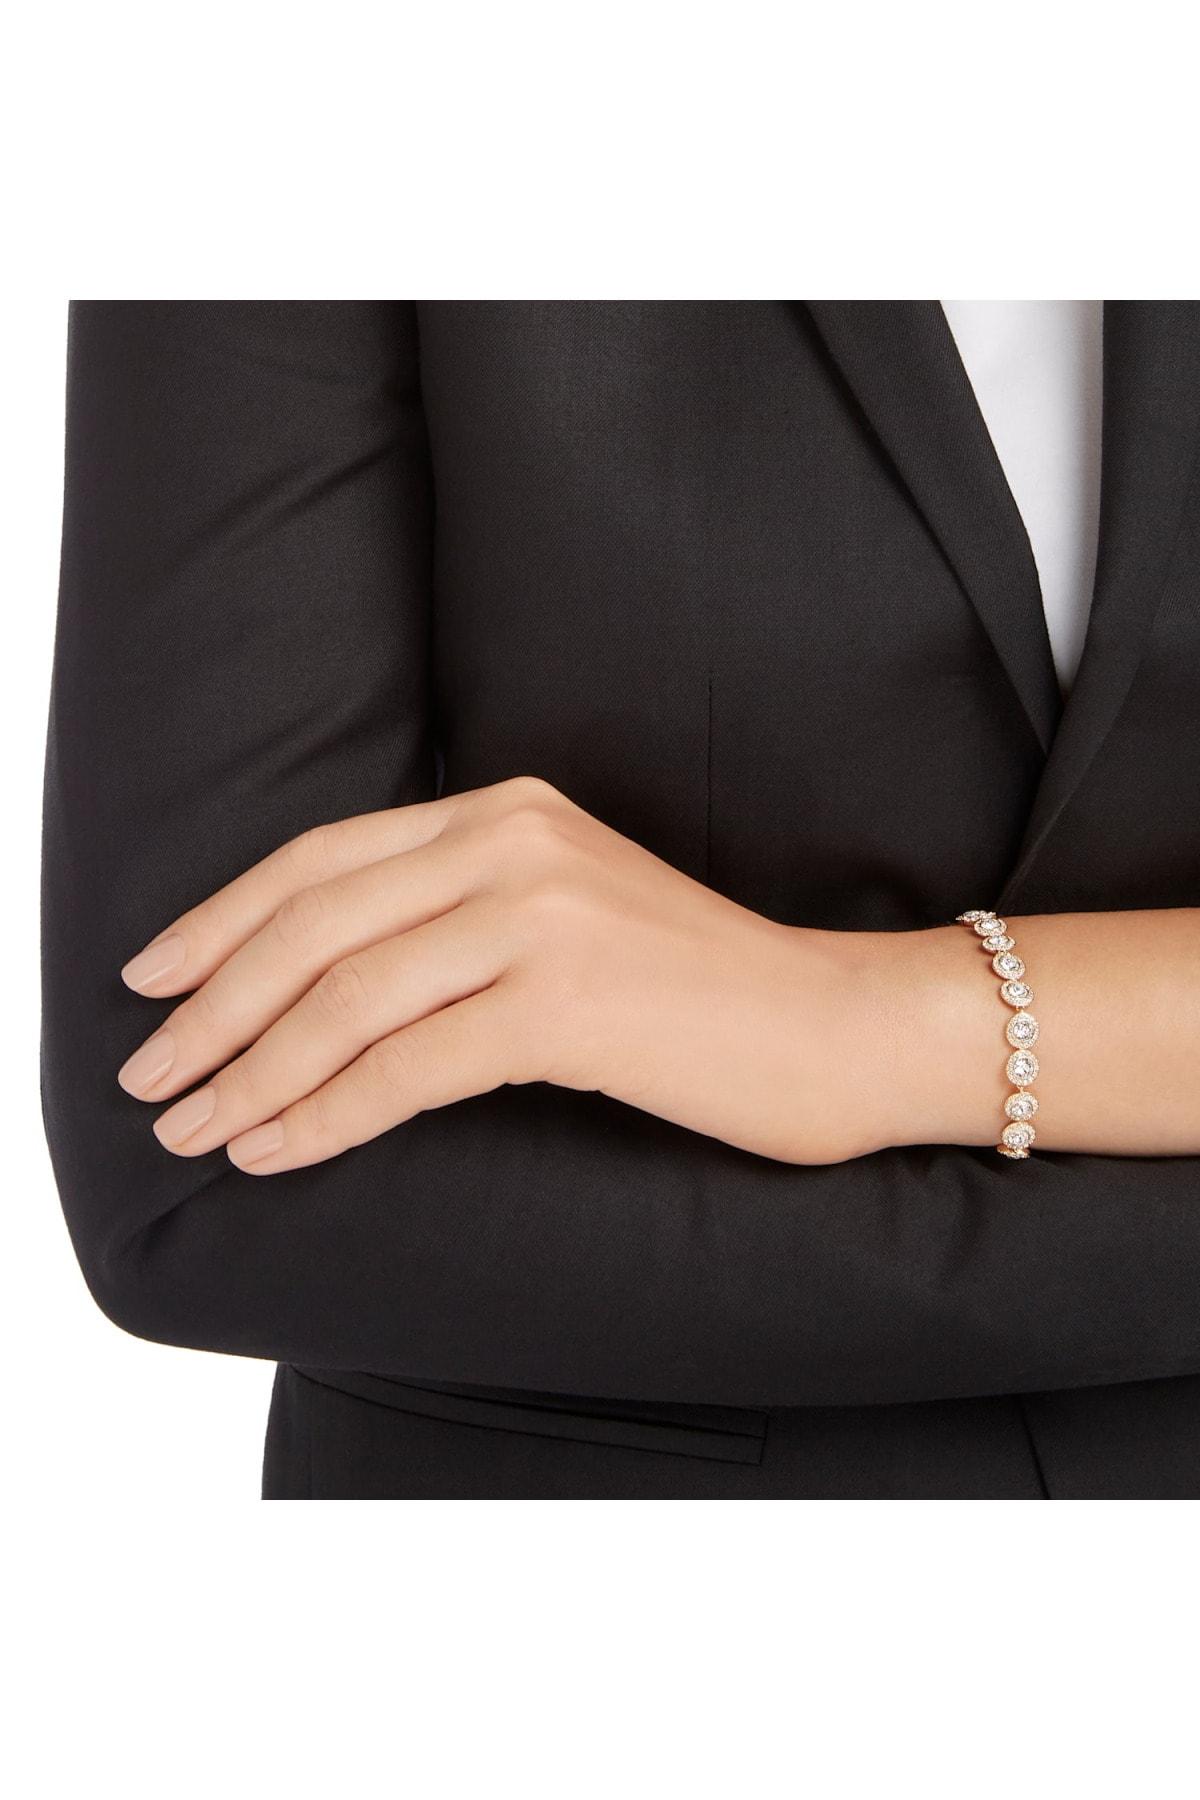 Swarovski Bilezik Angelic:bracelet Cry/ros M 5240513 2